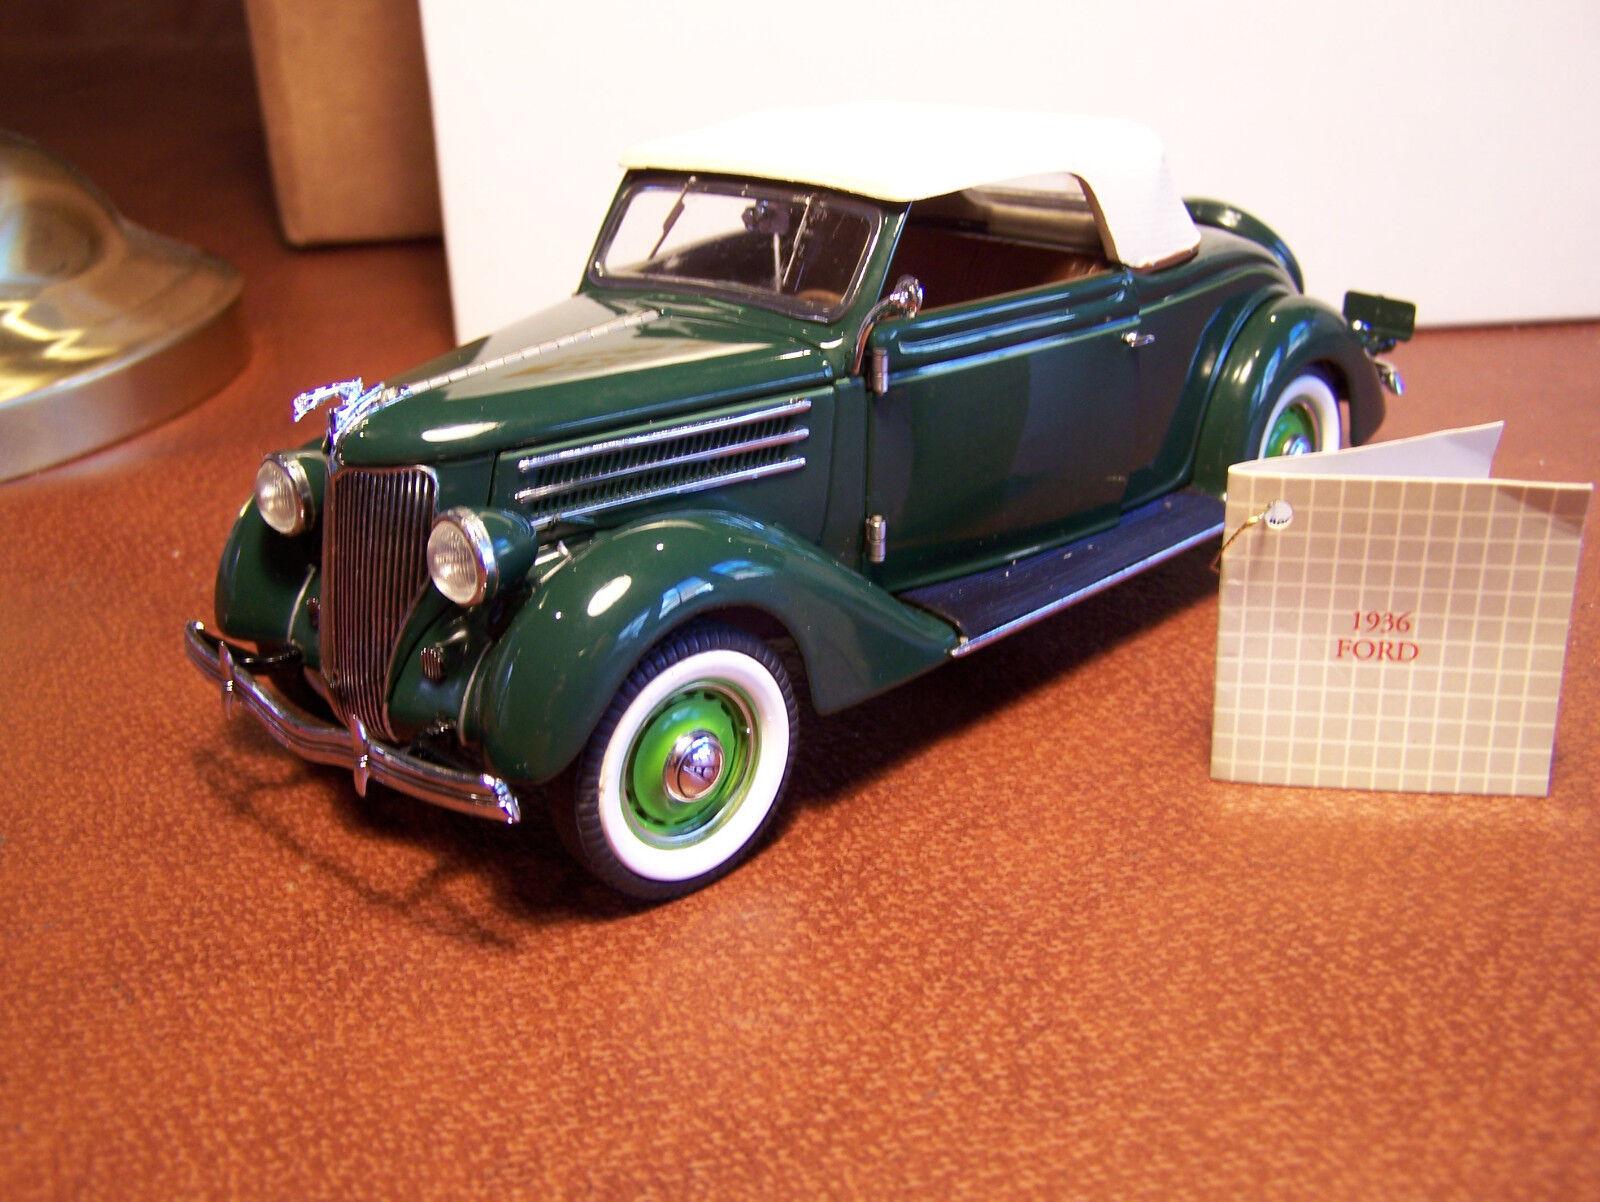 Franklin mint 1936 ford 24 mint in styropor - shell - docs oder kasten